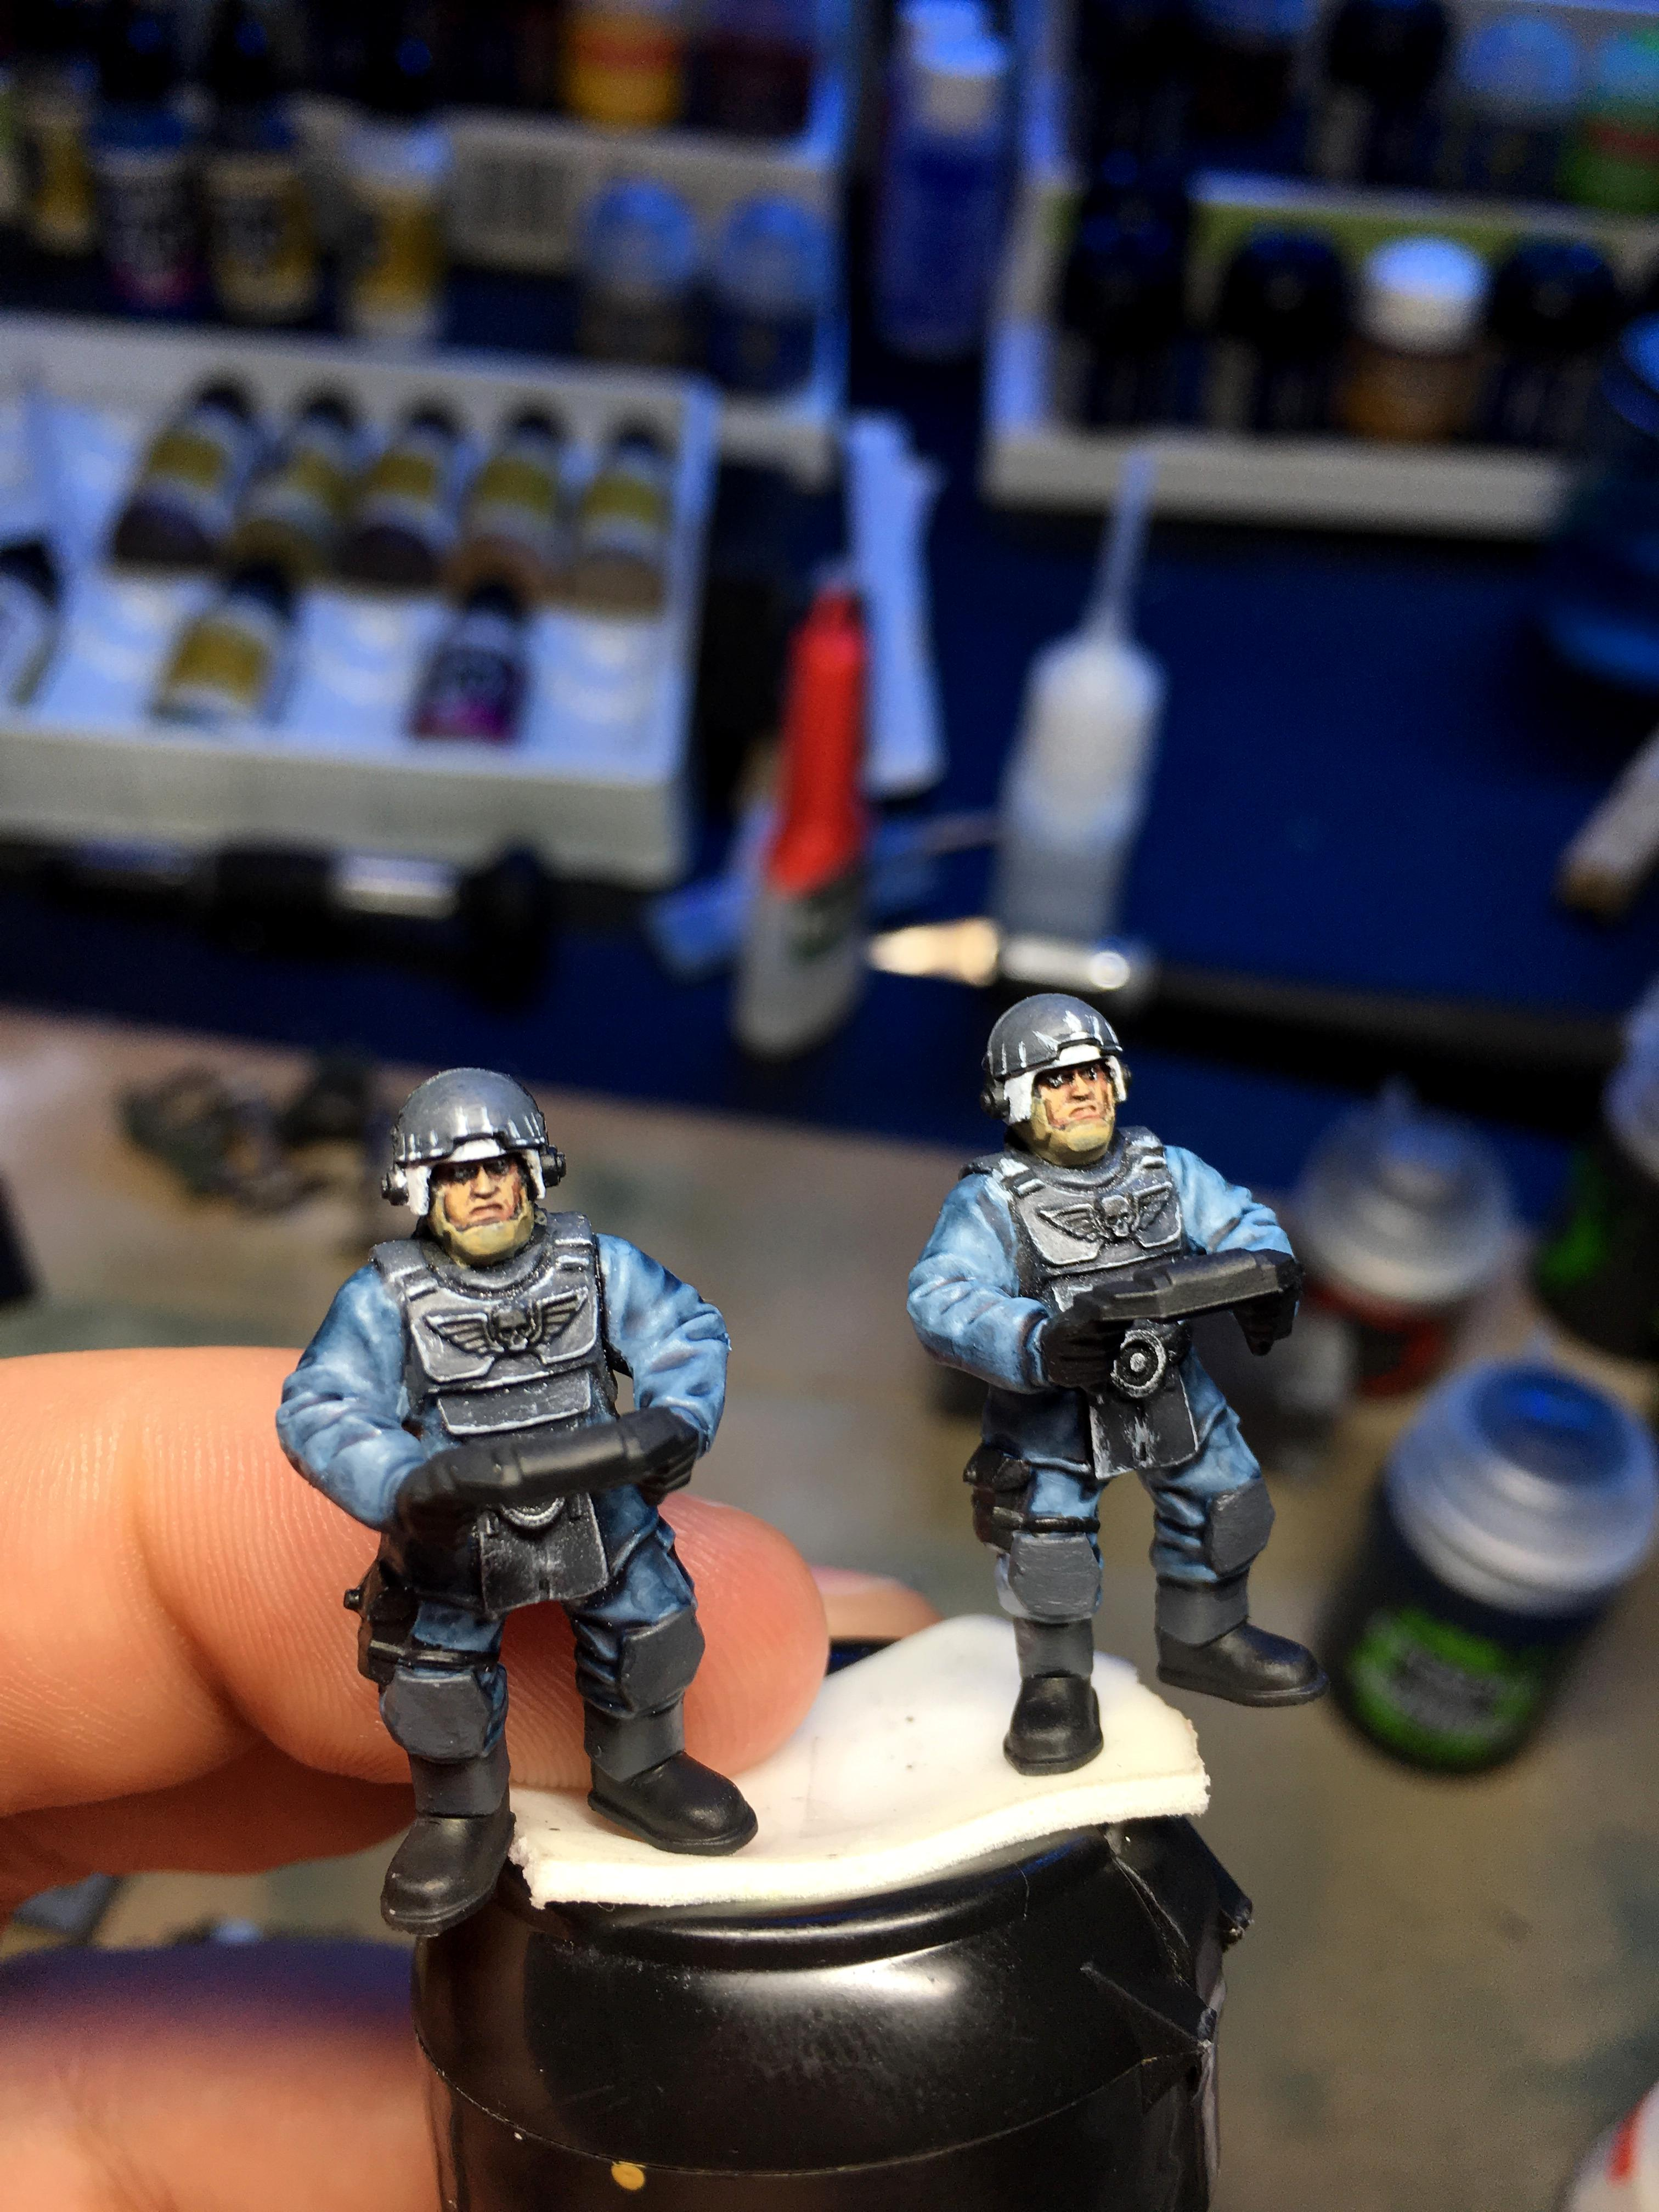 Door Gunner, Flyer, Imperial, Navy, Valkyrie